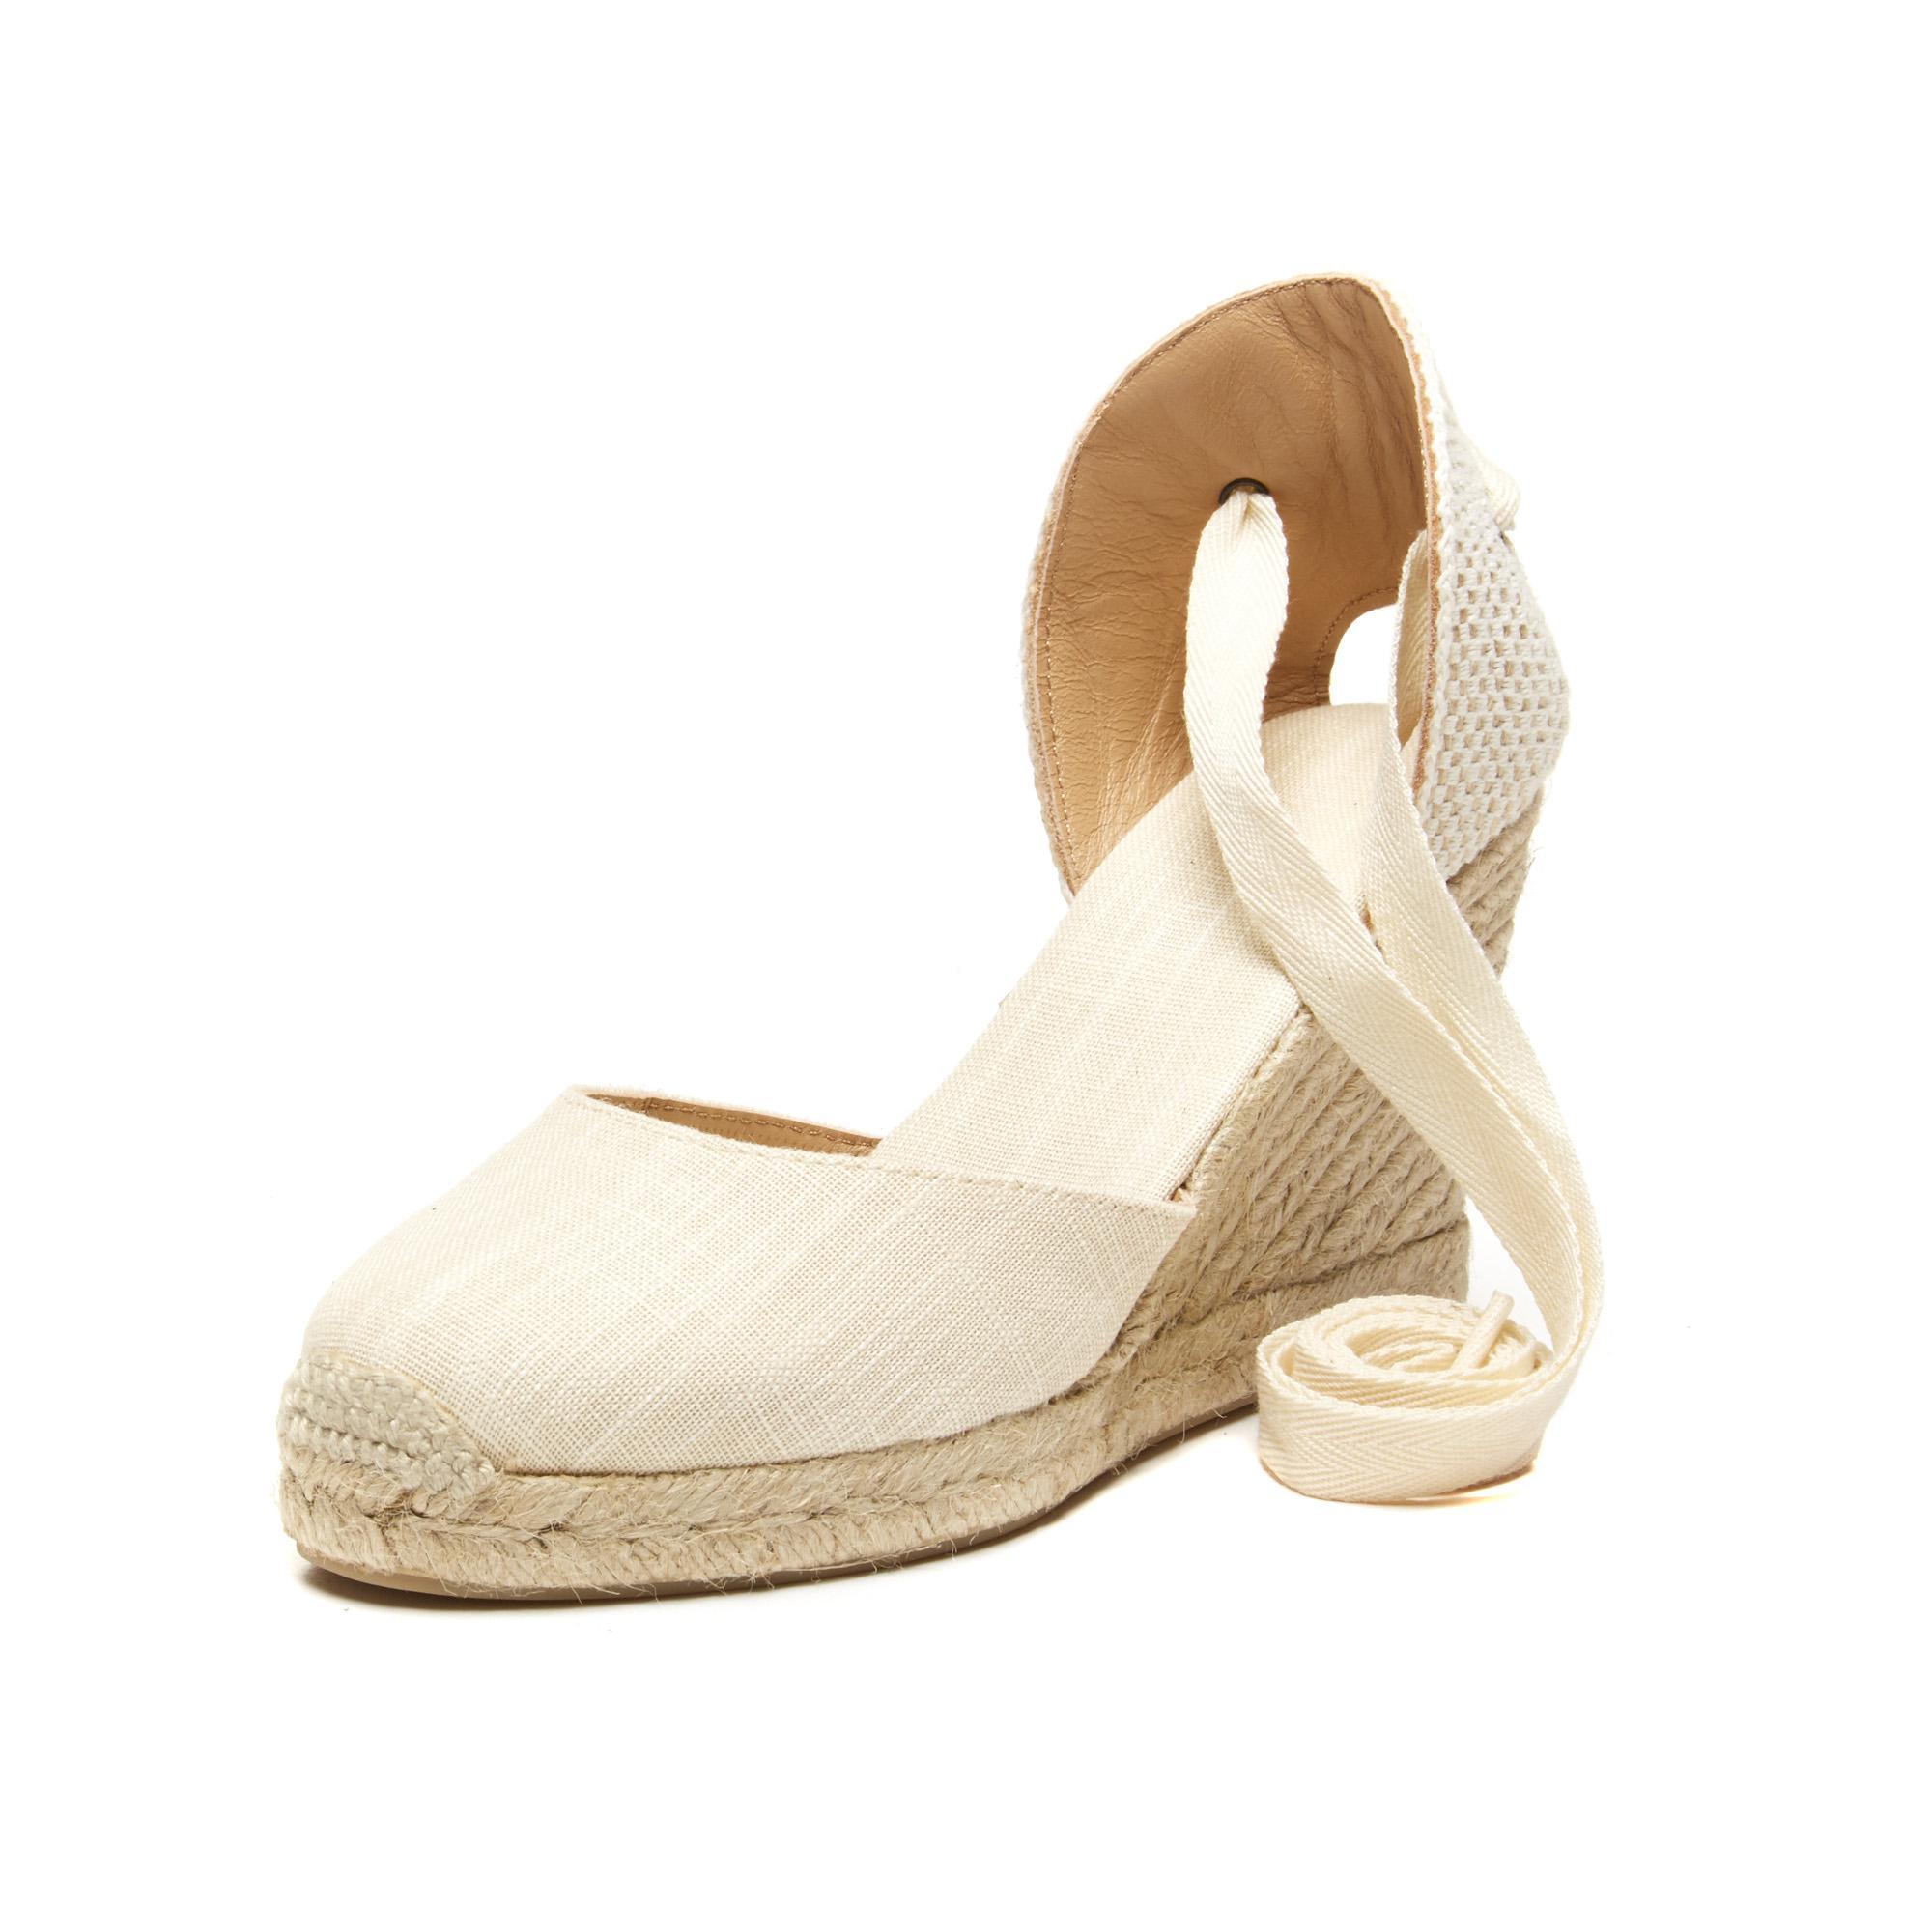 644a1daaa74 Lyst - Soludos Linen Espadrille Tall Wedge Sandal